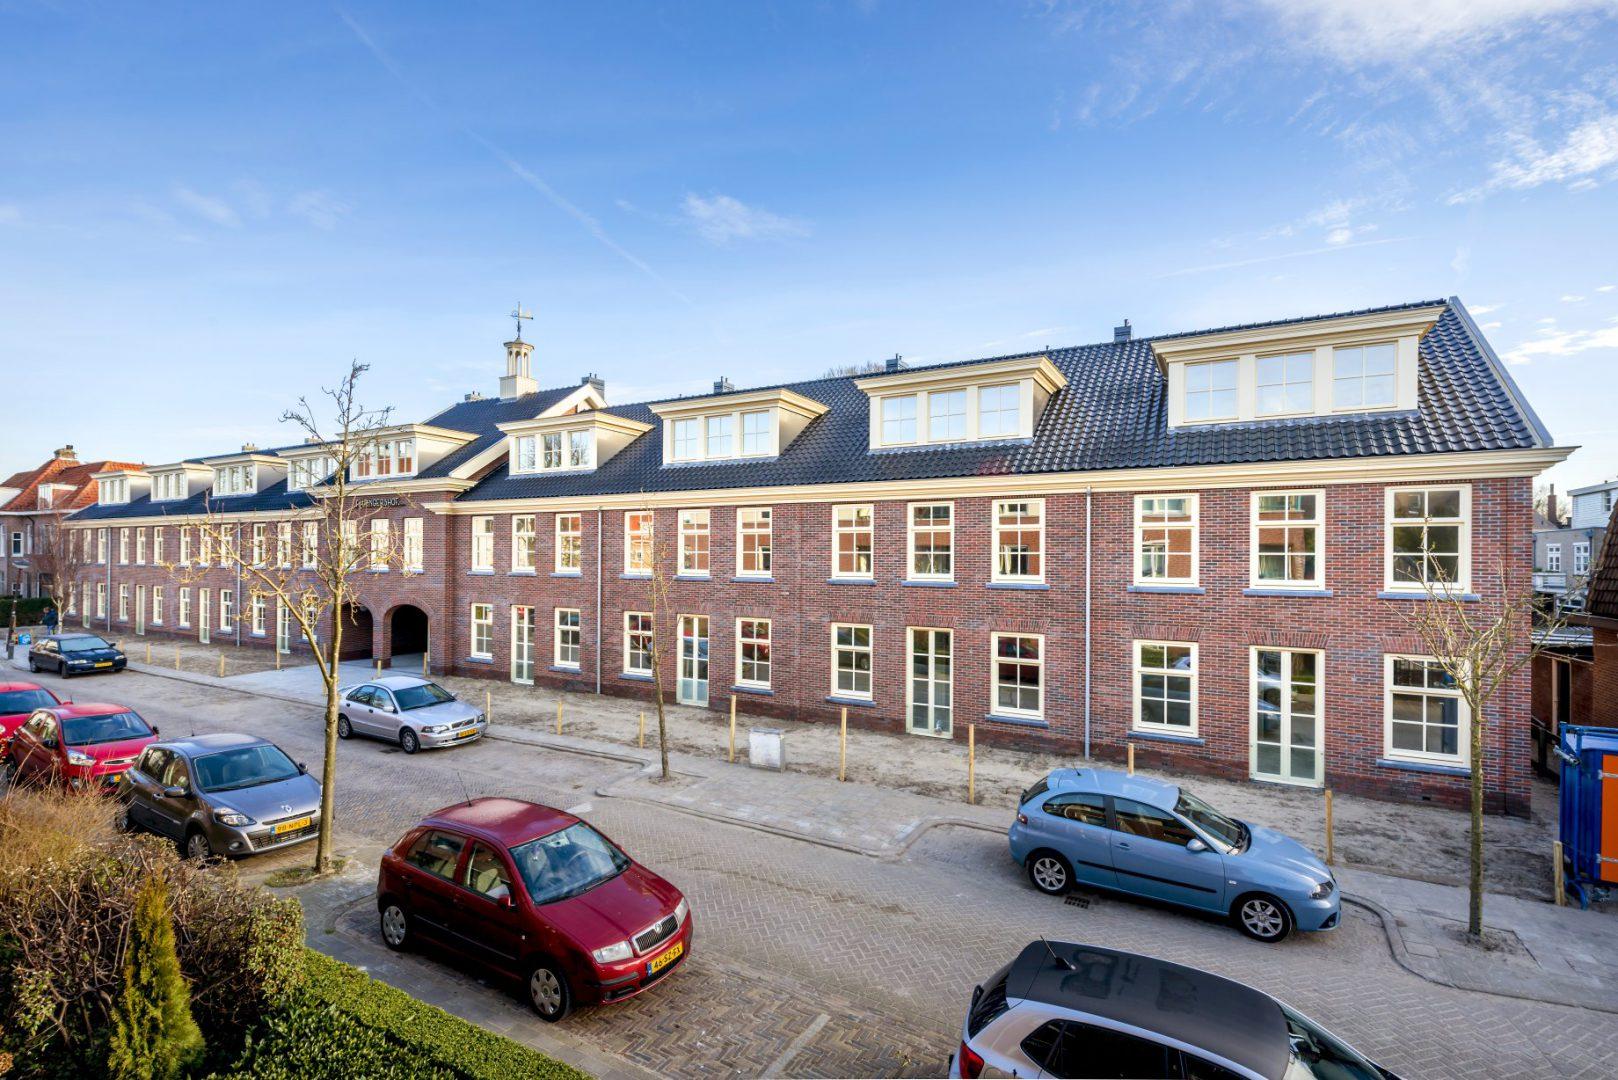 Ringershof-renovatie-ZIJLSTRA-SCHIPPER-architecten-architectenbureau-noord-holland-architect-001